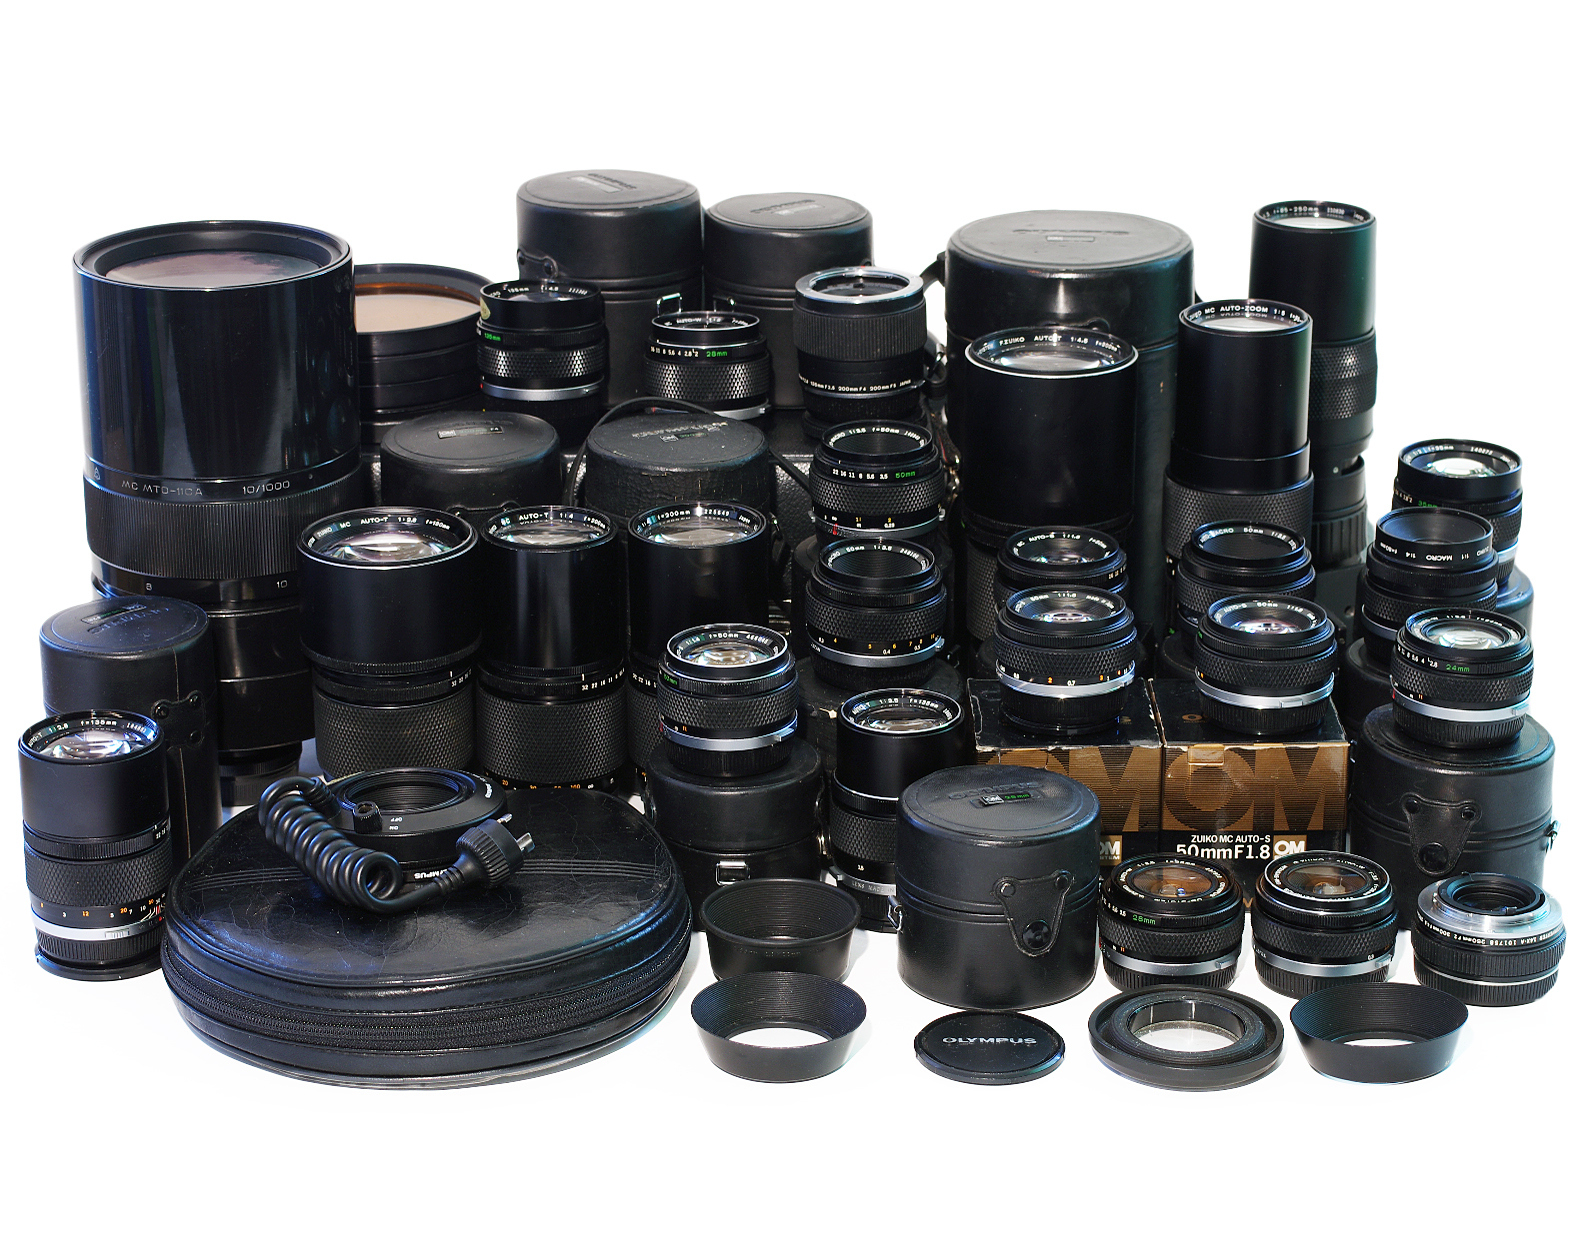 Lot-Olympus-Lenses-28mm-50mm-135mm-180mm-200mm-85-250mm-300mm